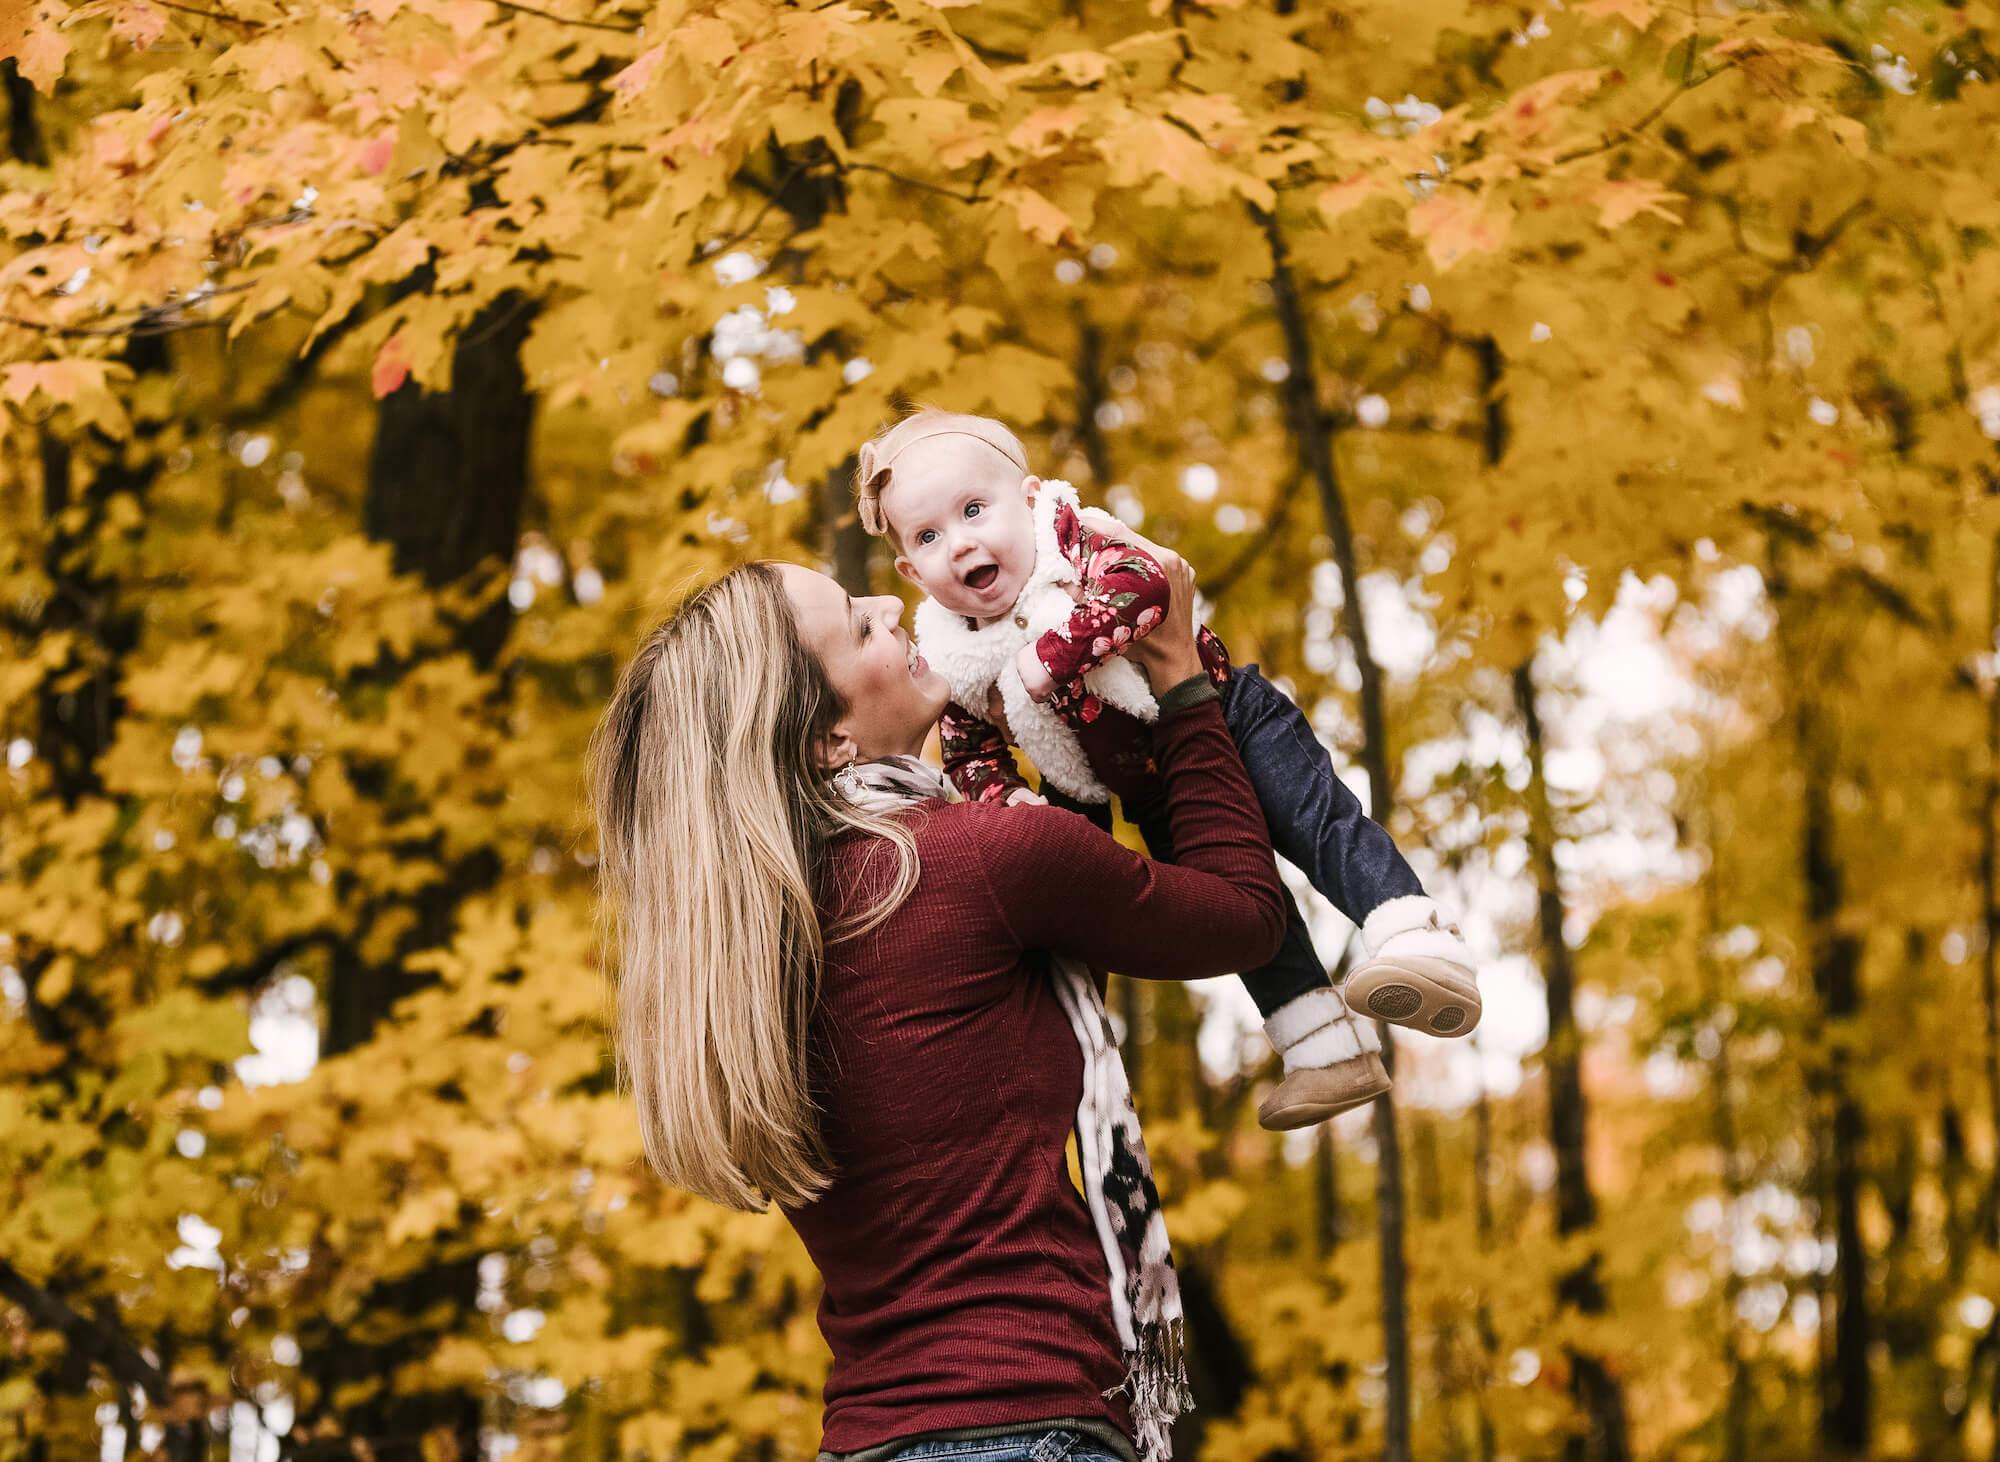 engle-olson-family-photography-session-16.jpg